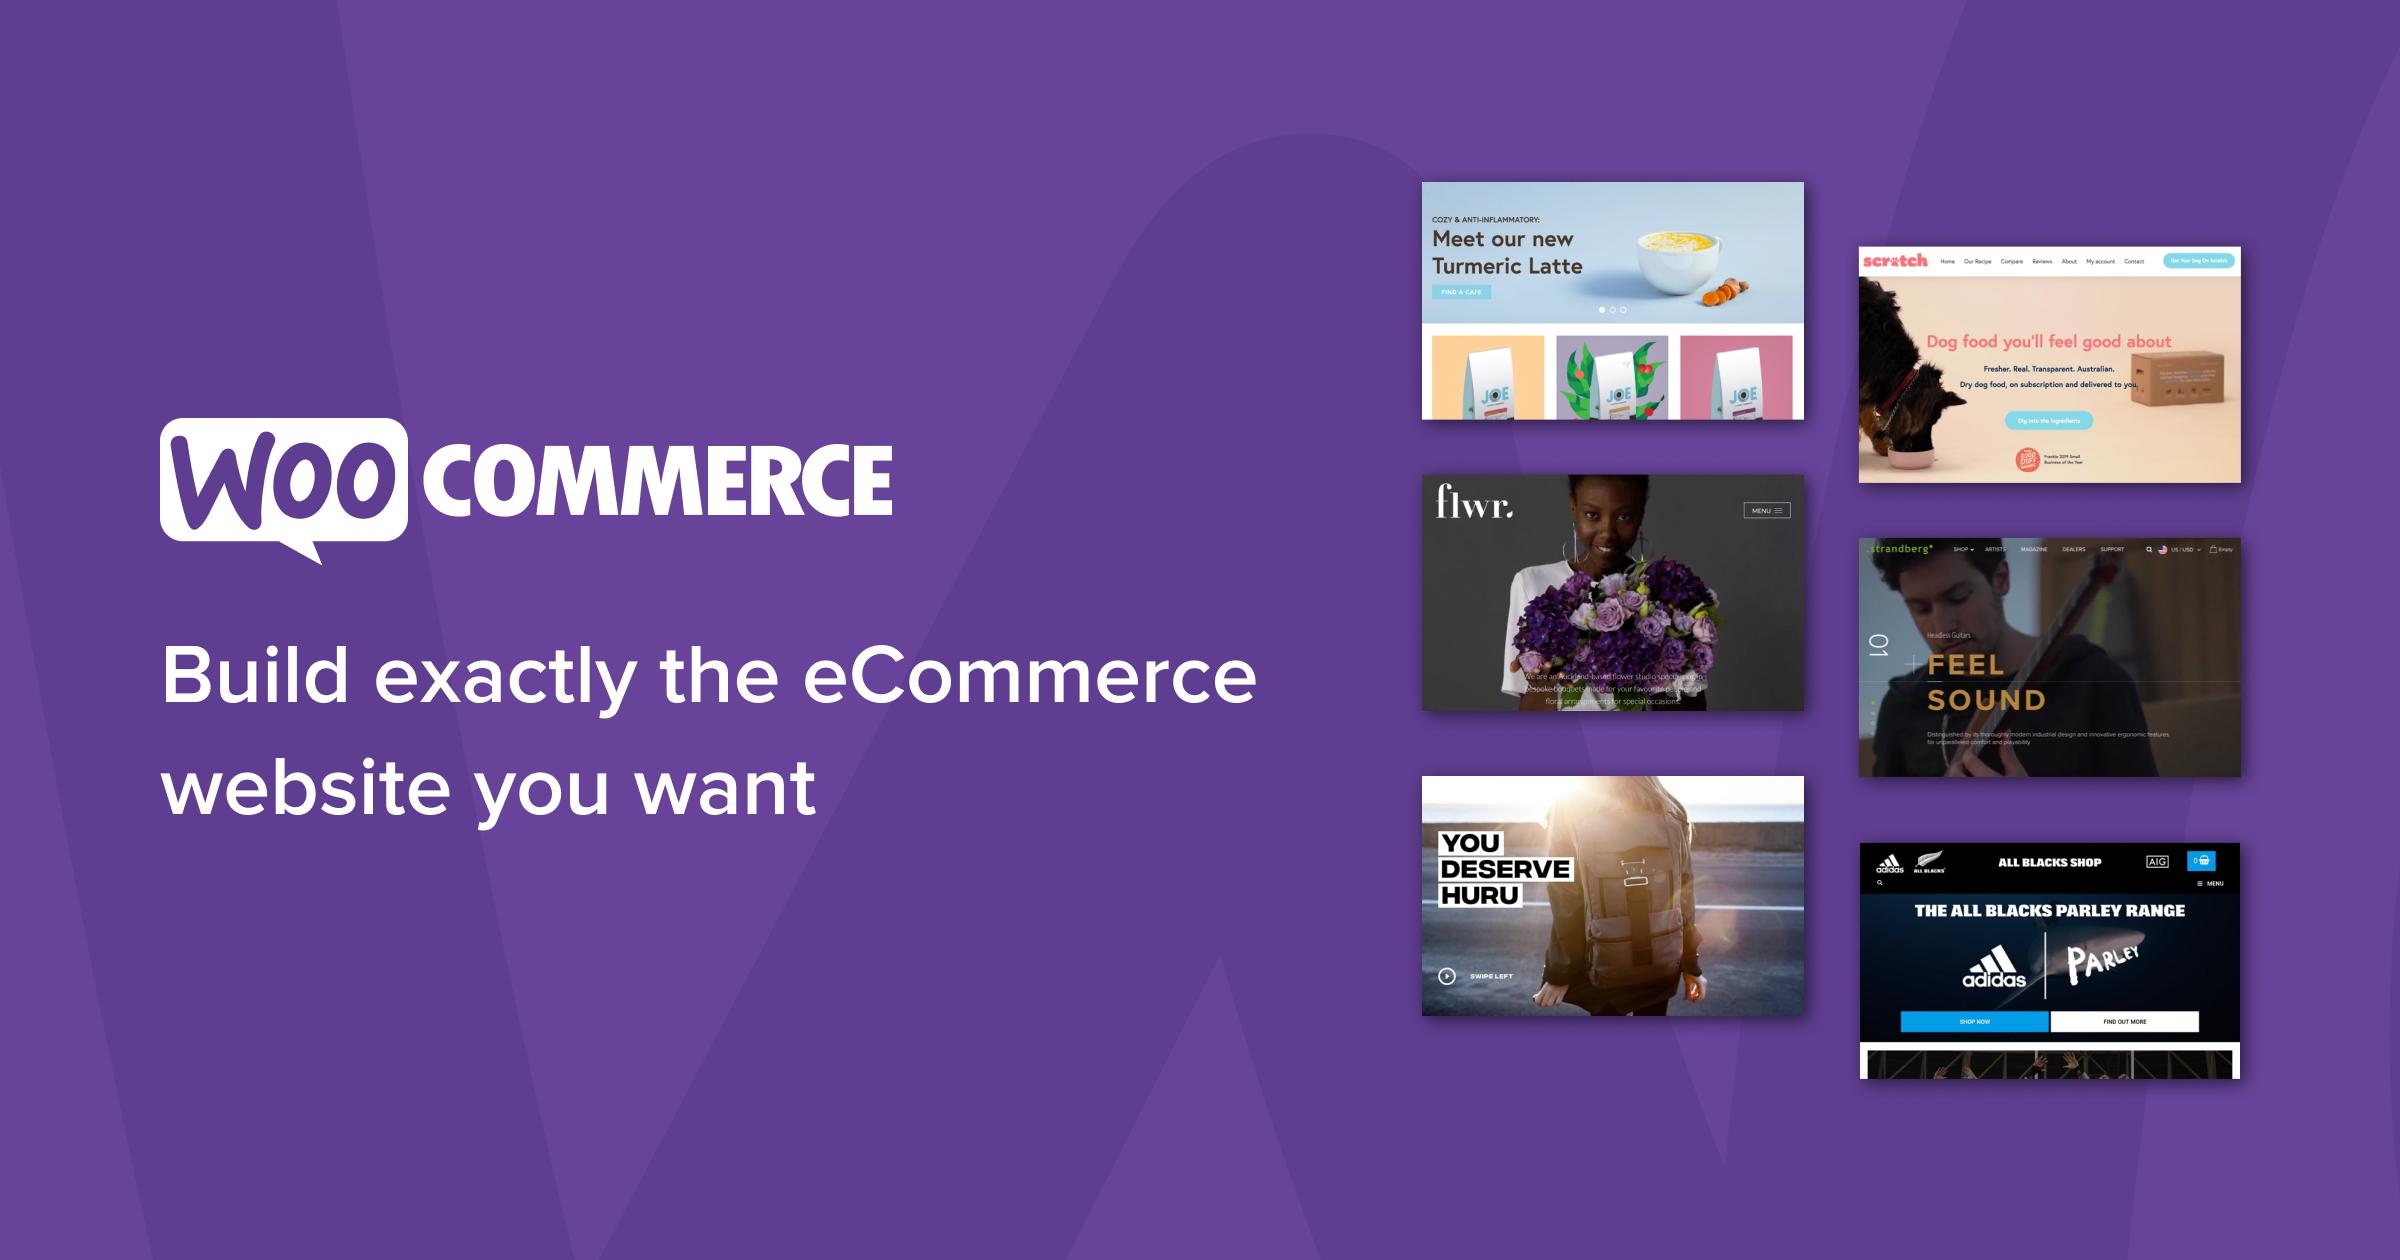 WooCommerce Aramex - WooCommerce